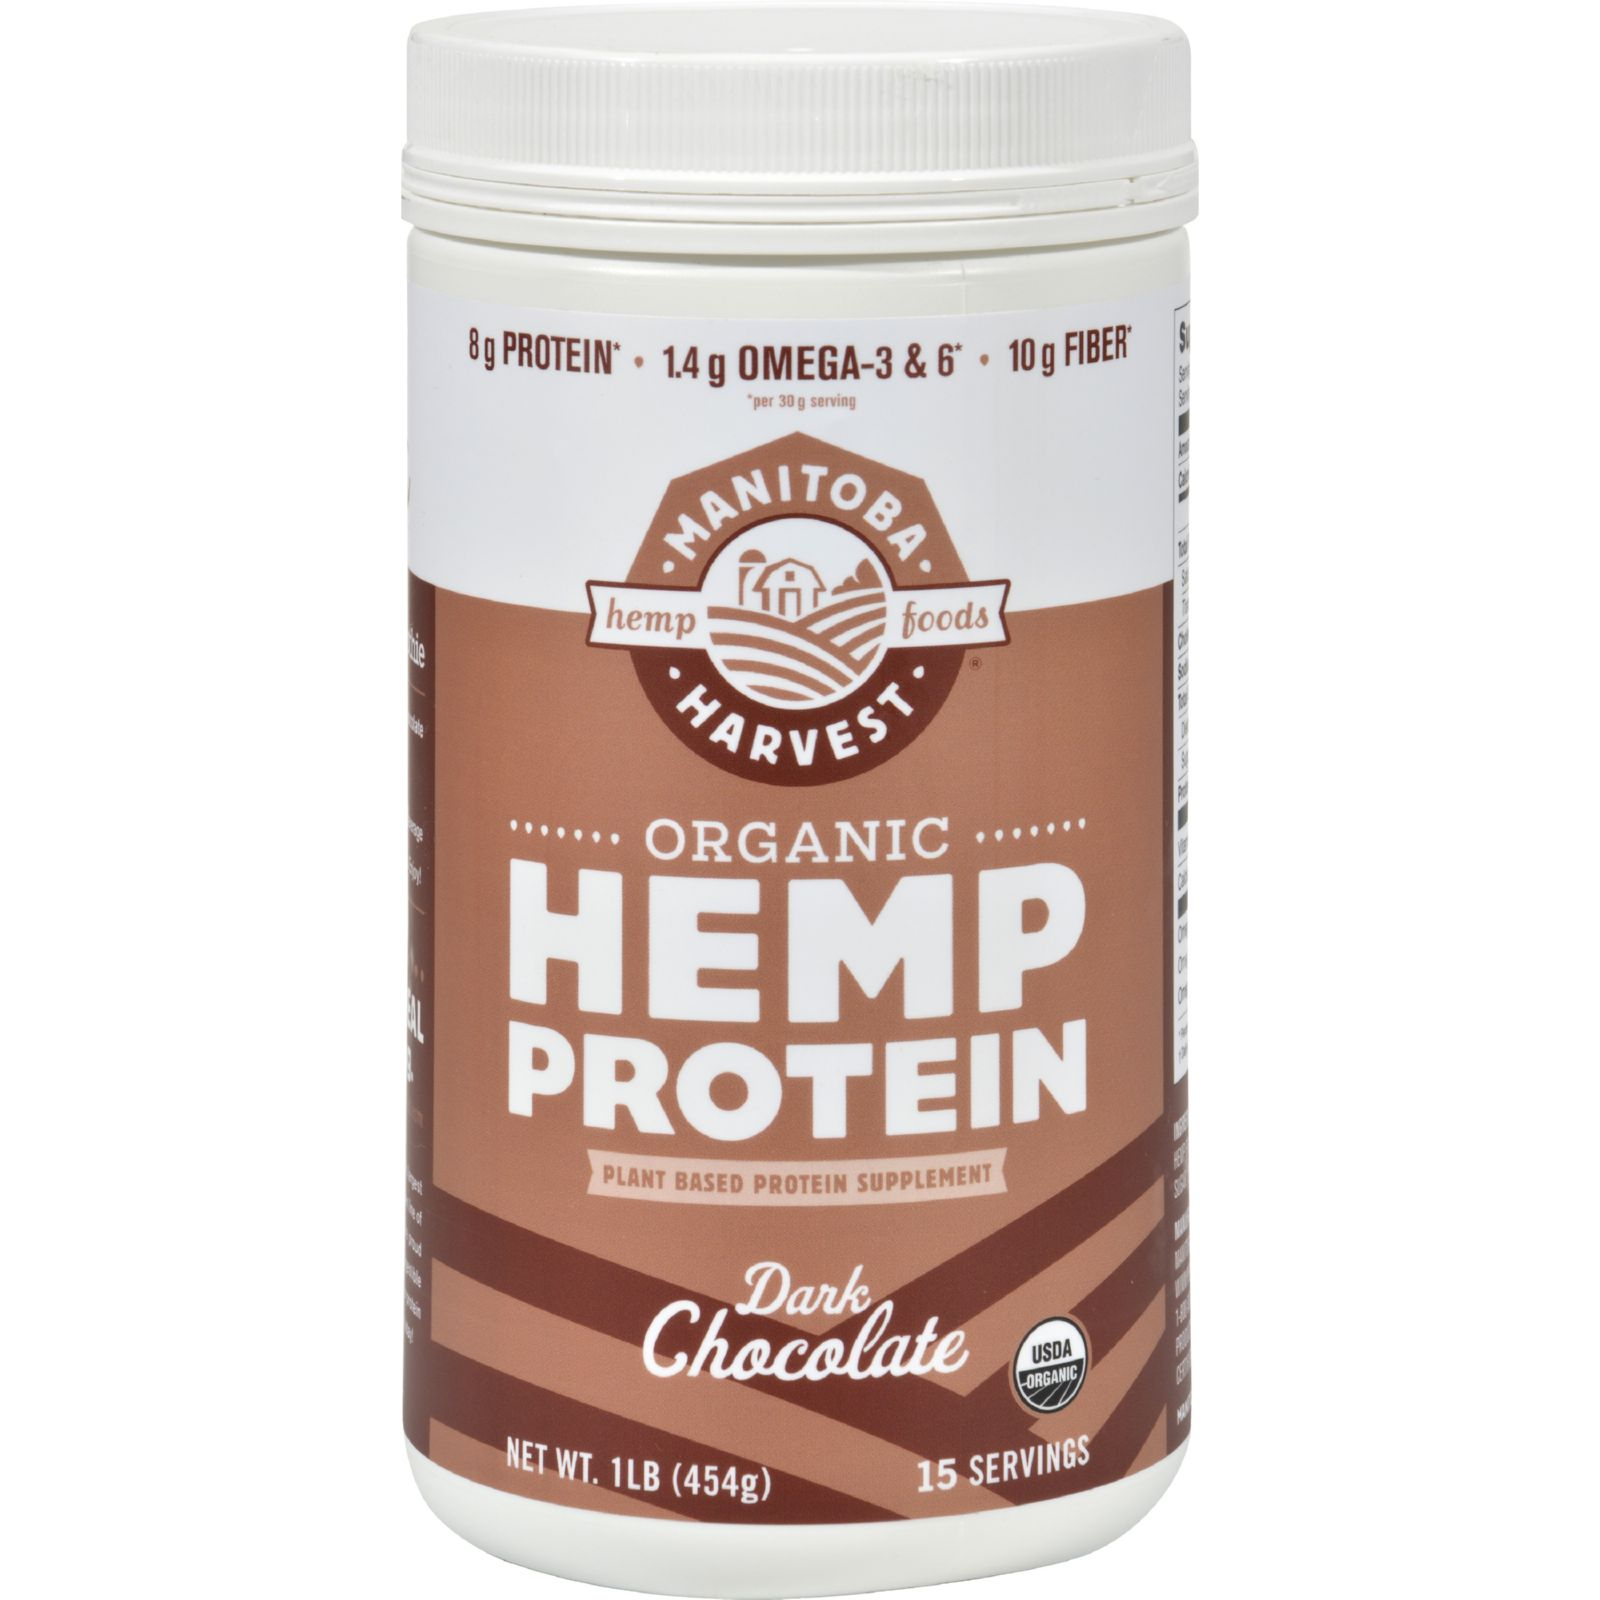 Manitoba Harvest Organic Hemp Protein Dark Chocolate - 16 oz